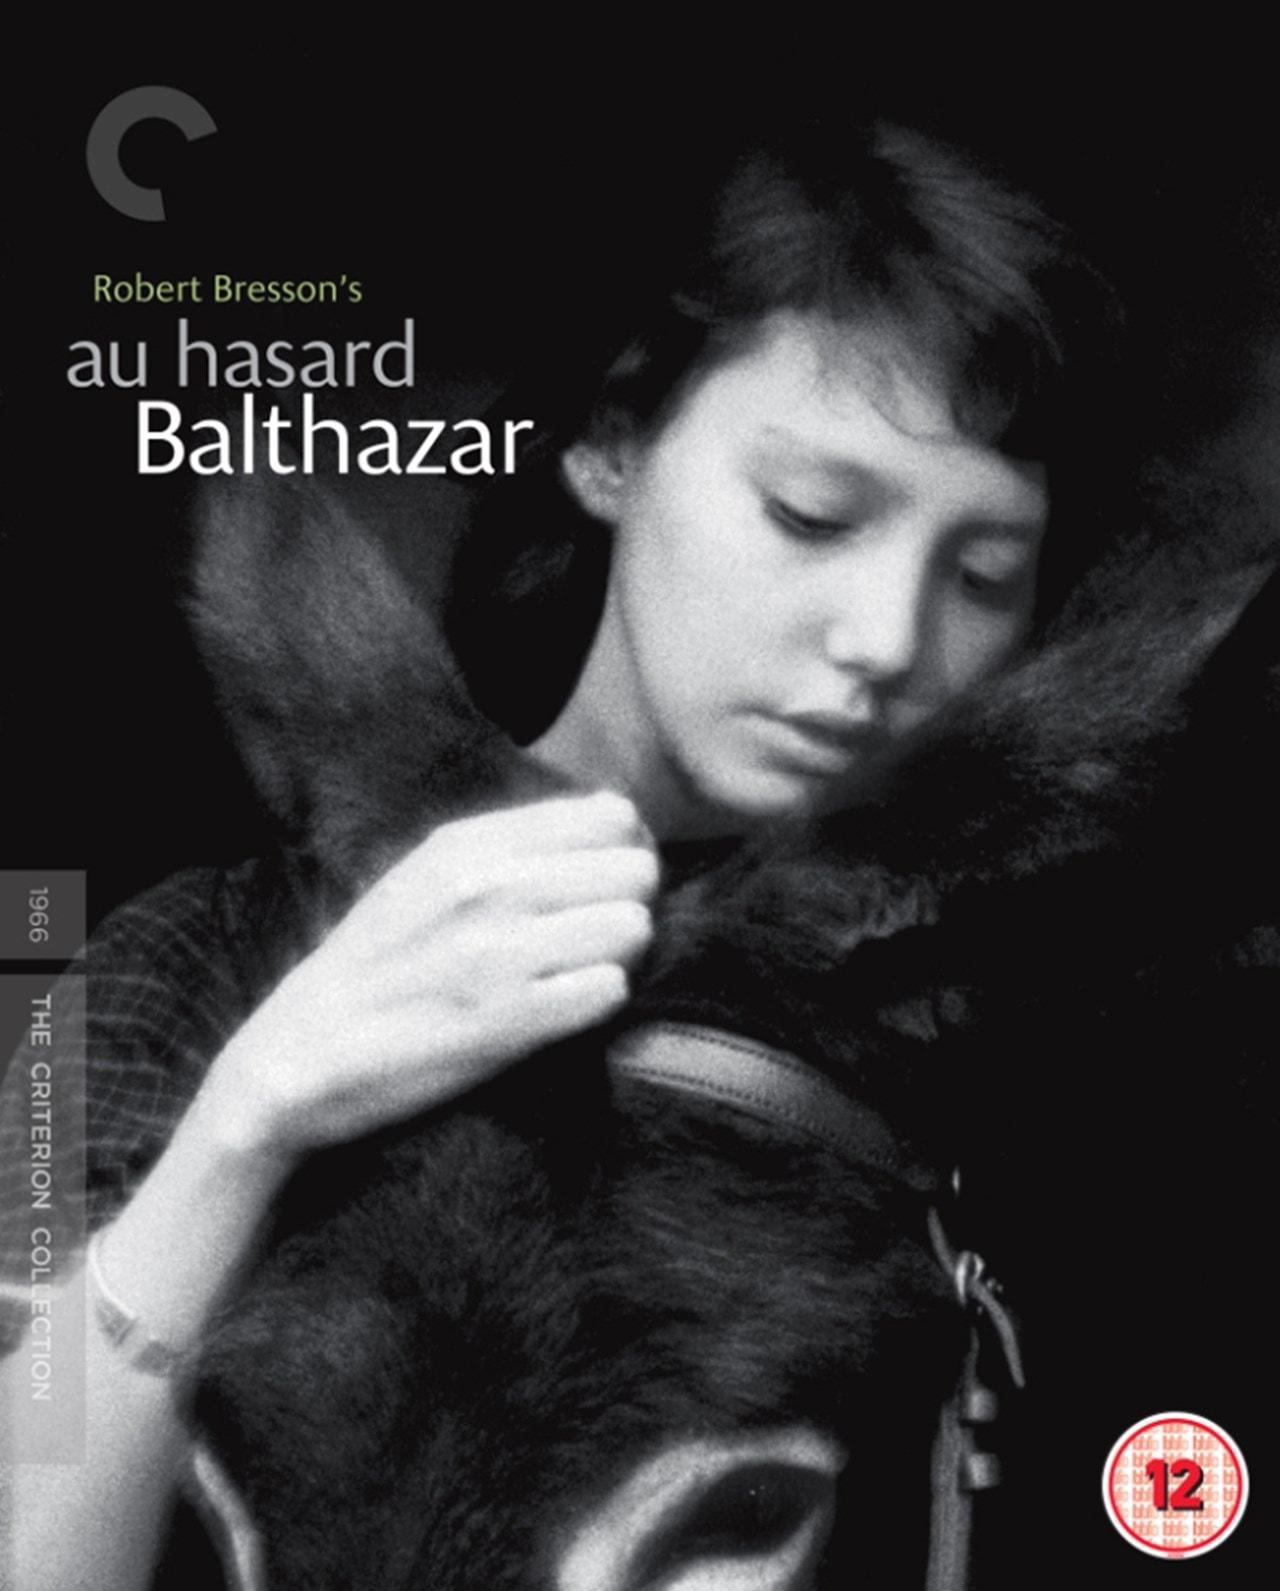 Au Hasard Balthazar - The Criterion Collection - 1